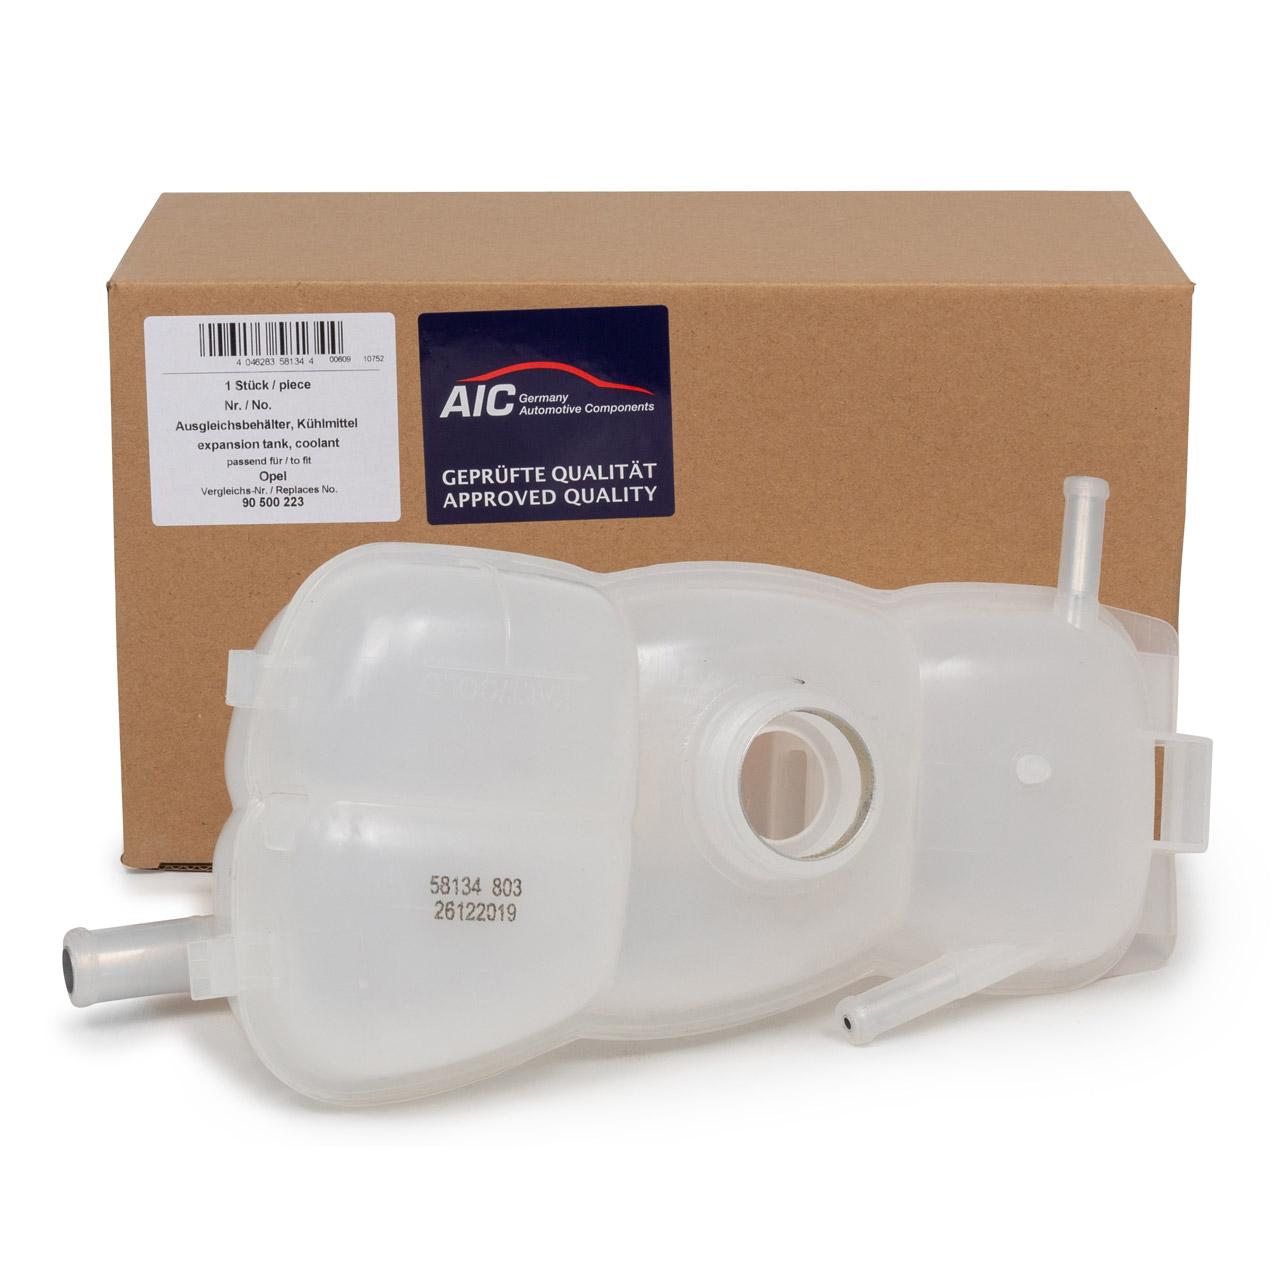 AIC 58134 Ausgleichsbehälter Kühlmittelbehälter OPEL Omega B 90500223 / 1304203